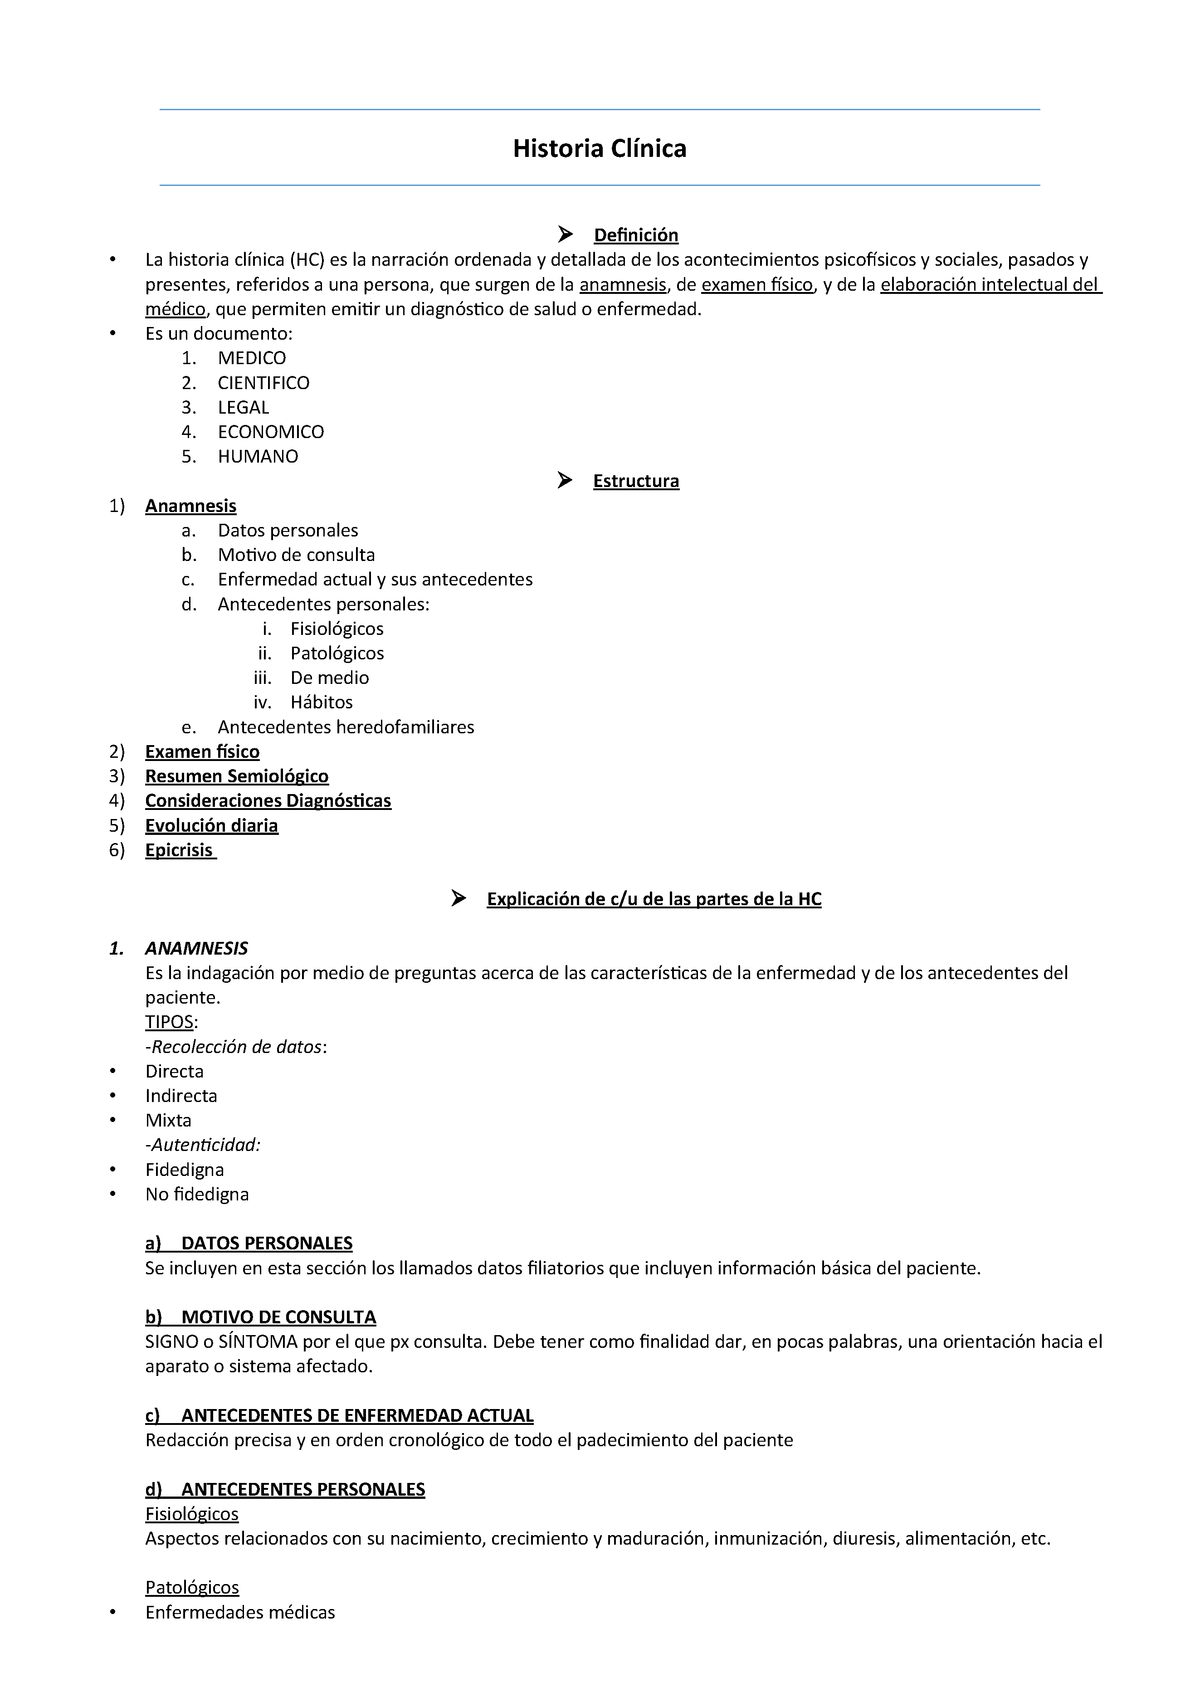 Historia Clinica Bioquimica Salud Publica 3450 Studocu